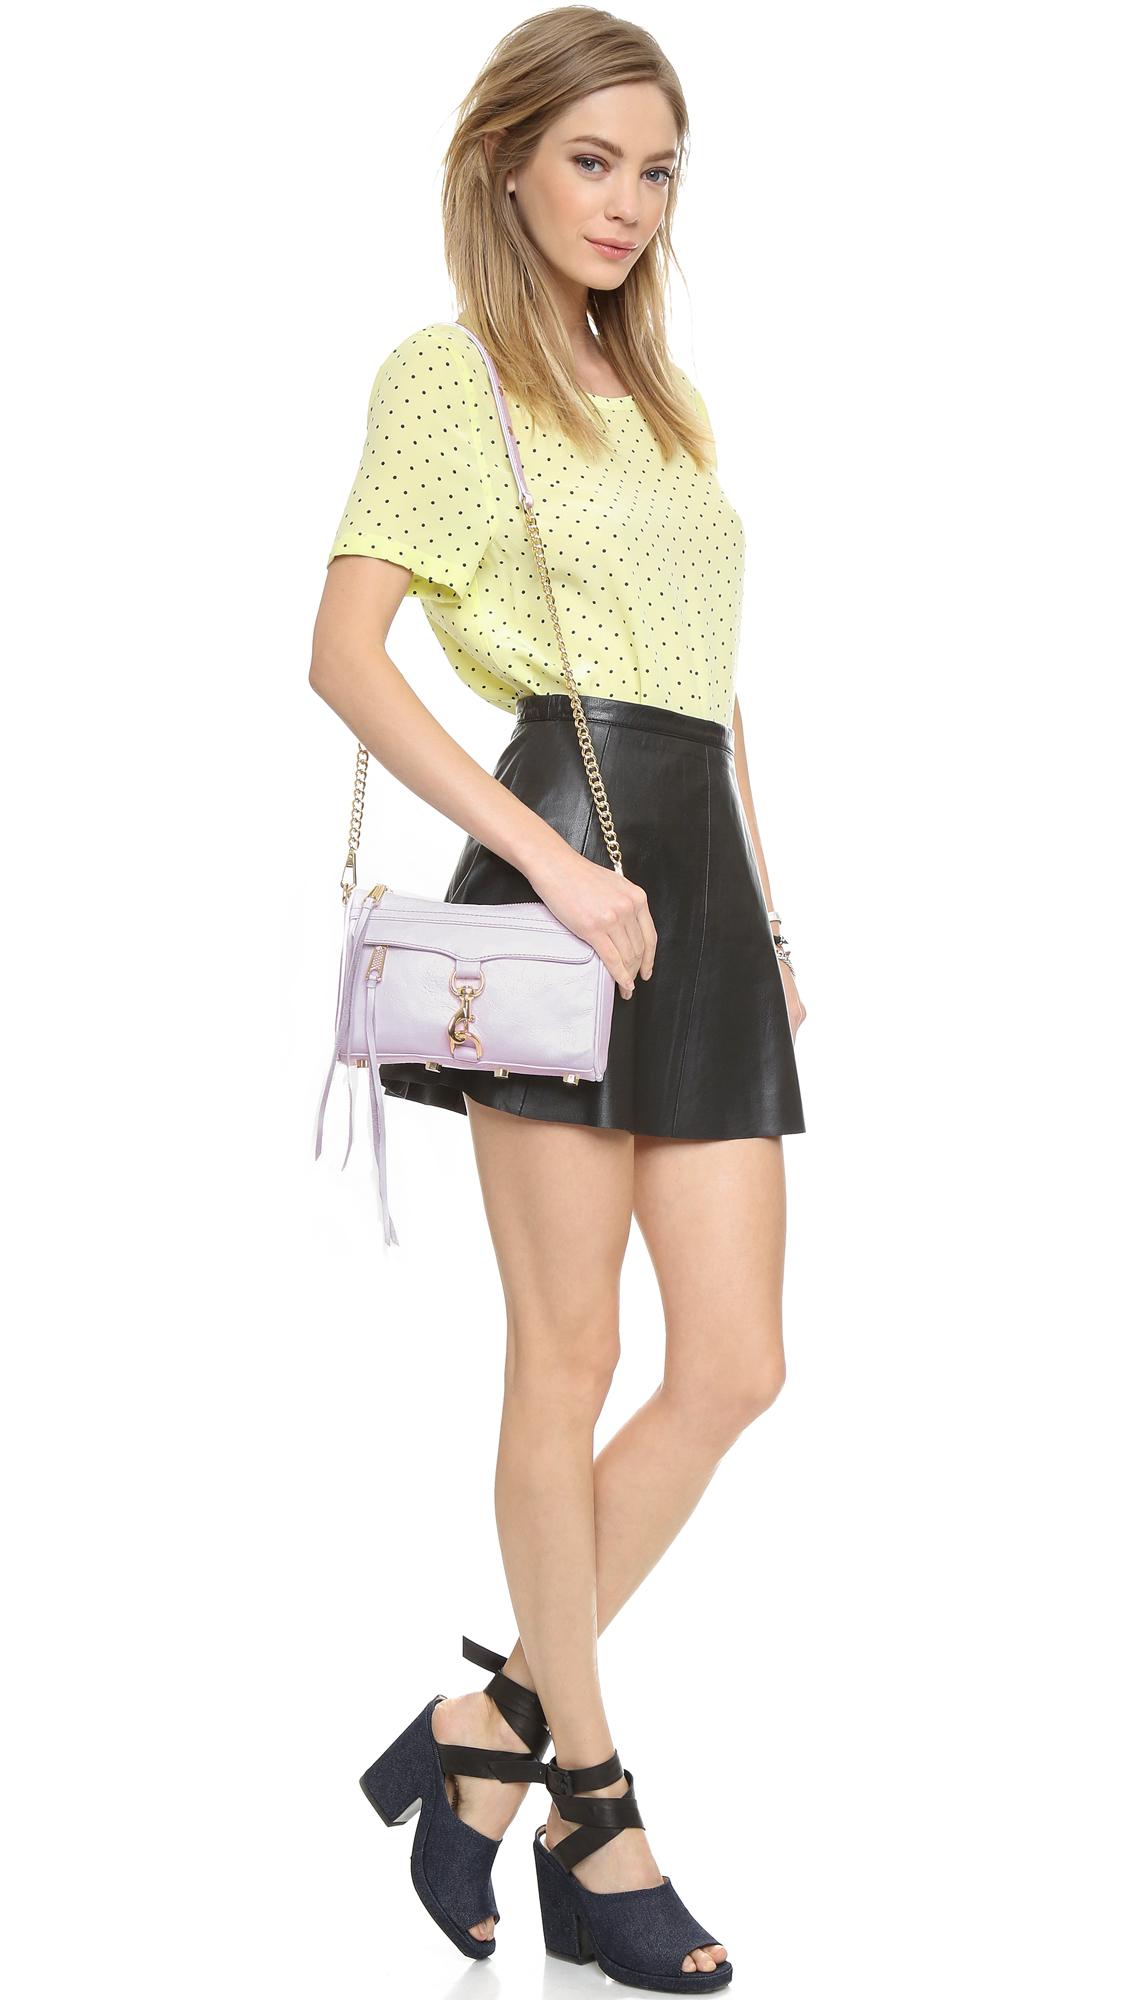 Mini M.A.C shoulder bag - White Rebecca Minkoff Very Cheap Sale Online Cheap Sale Sast 0URAQoUgS